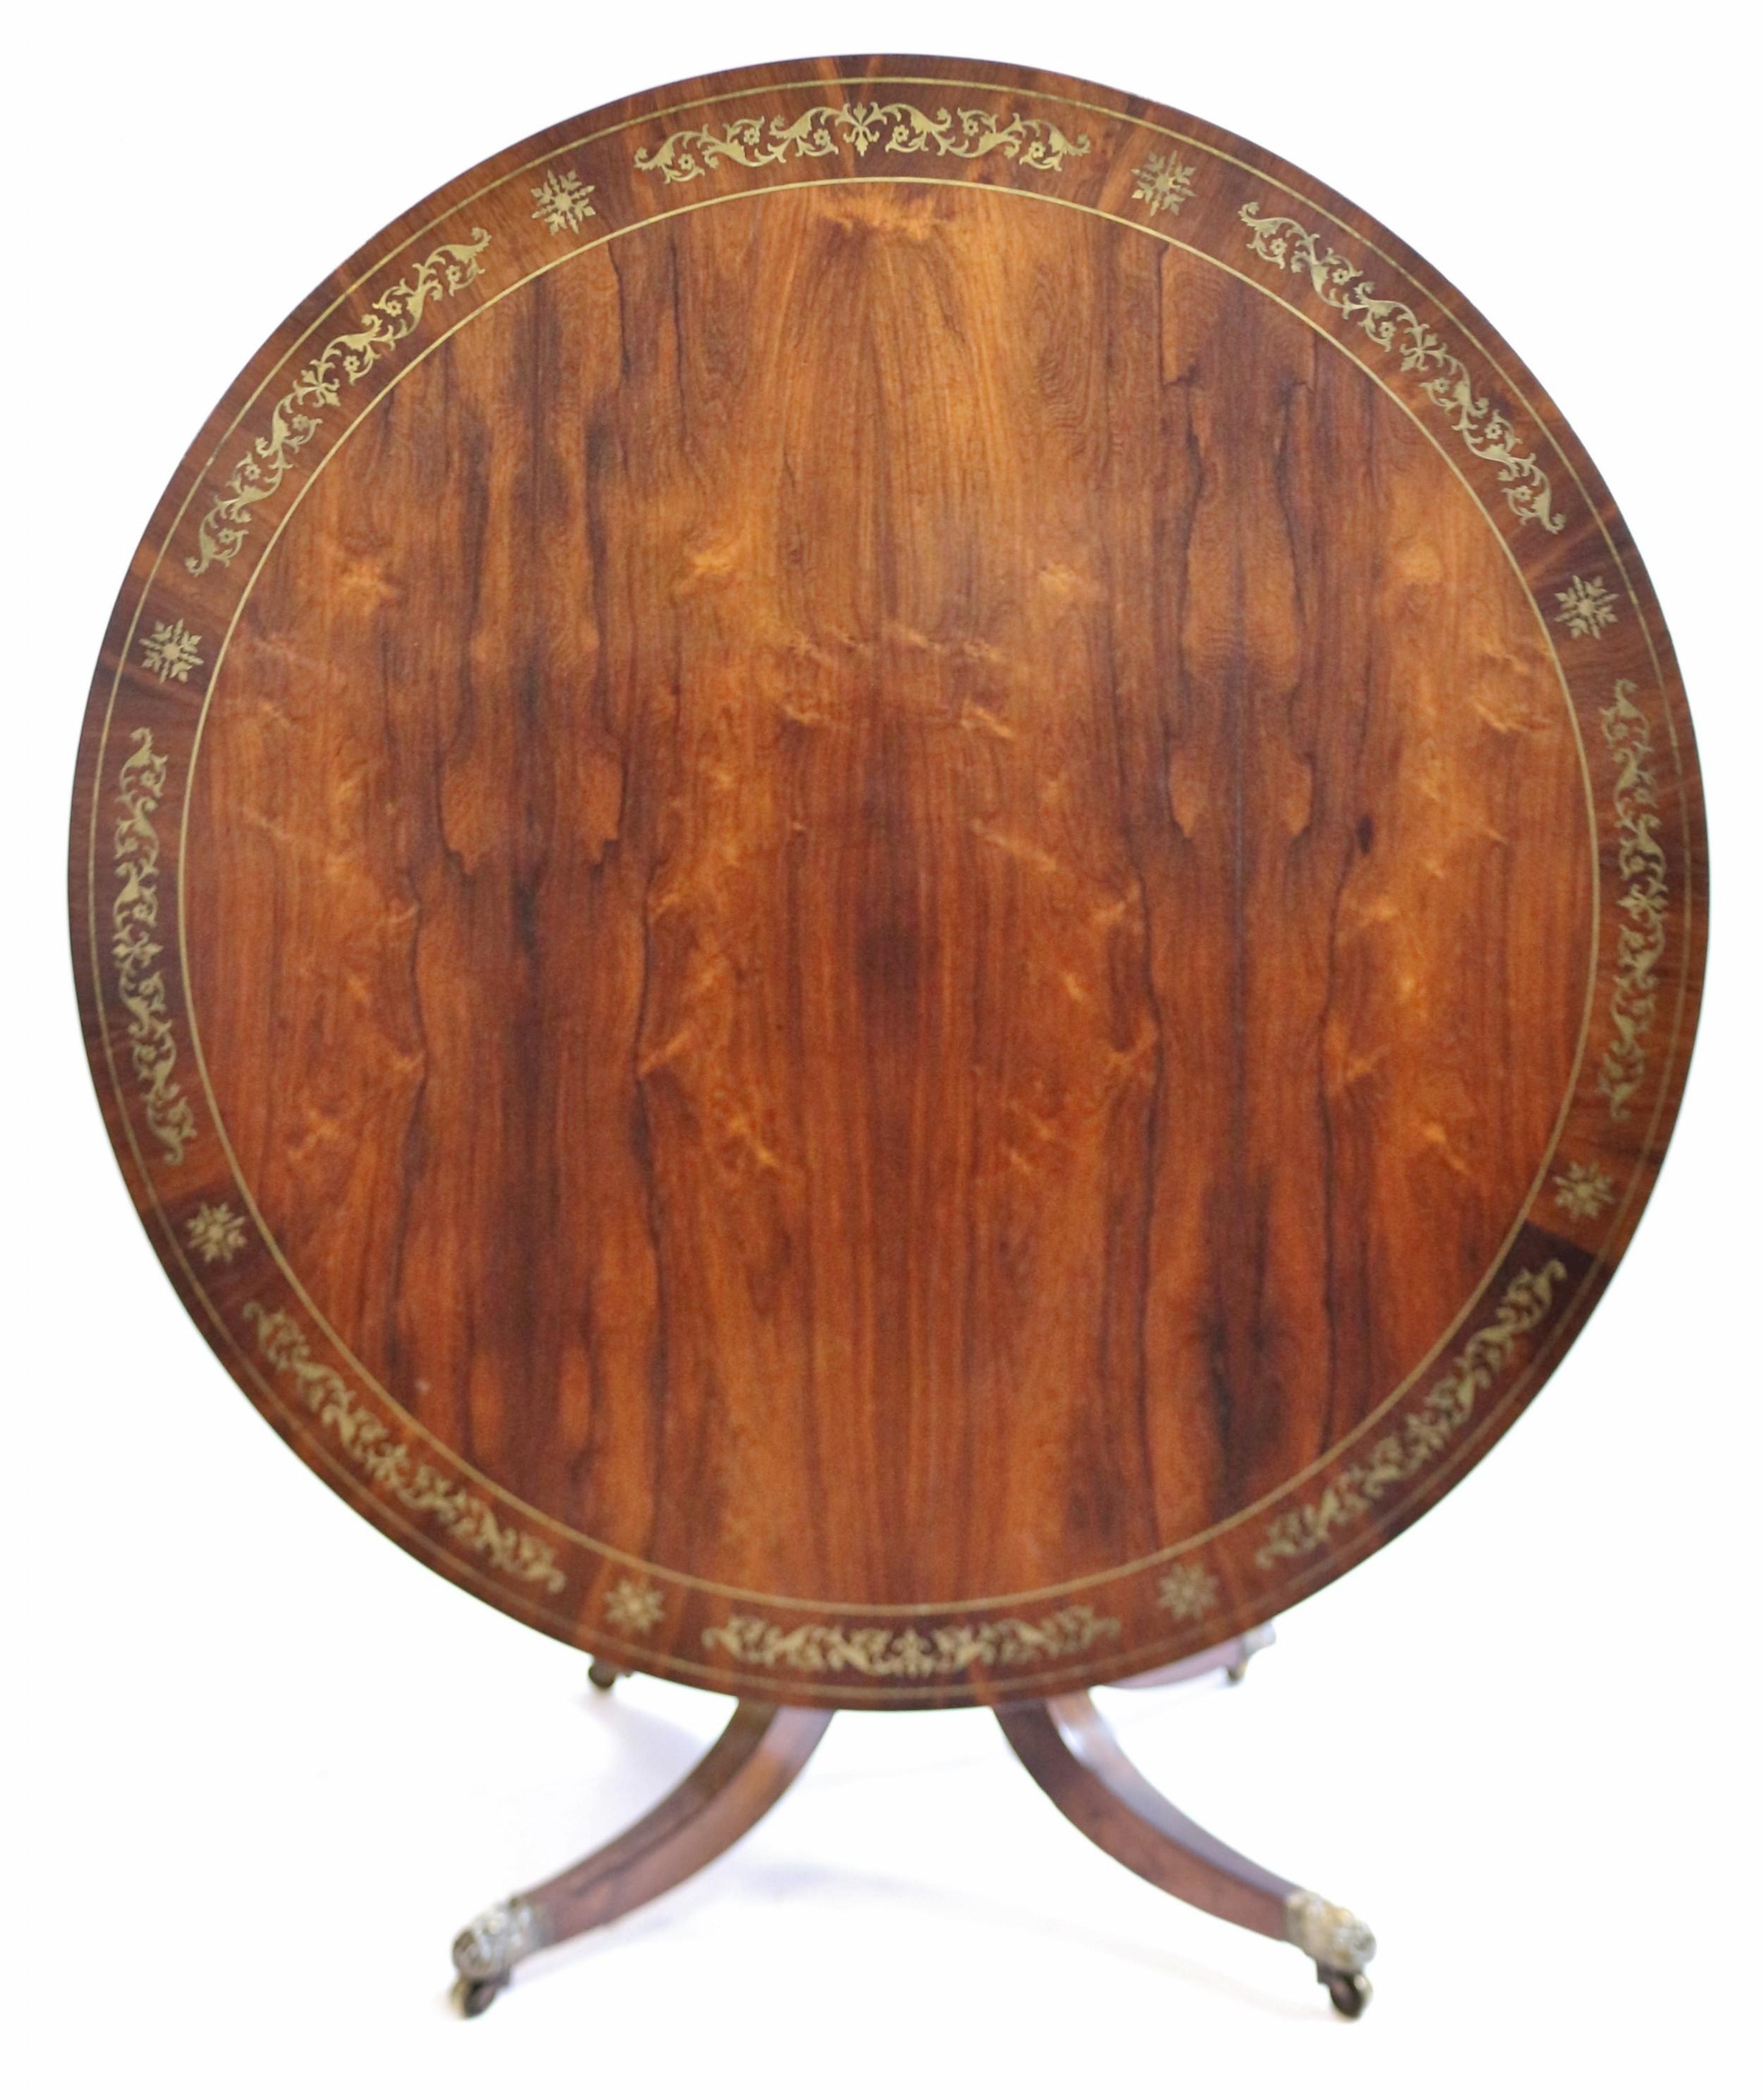 regency rosewood circular brass inlaid pedestal centre table